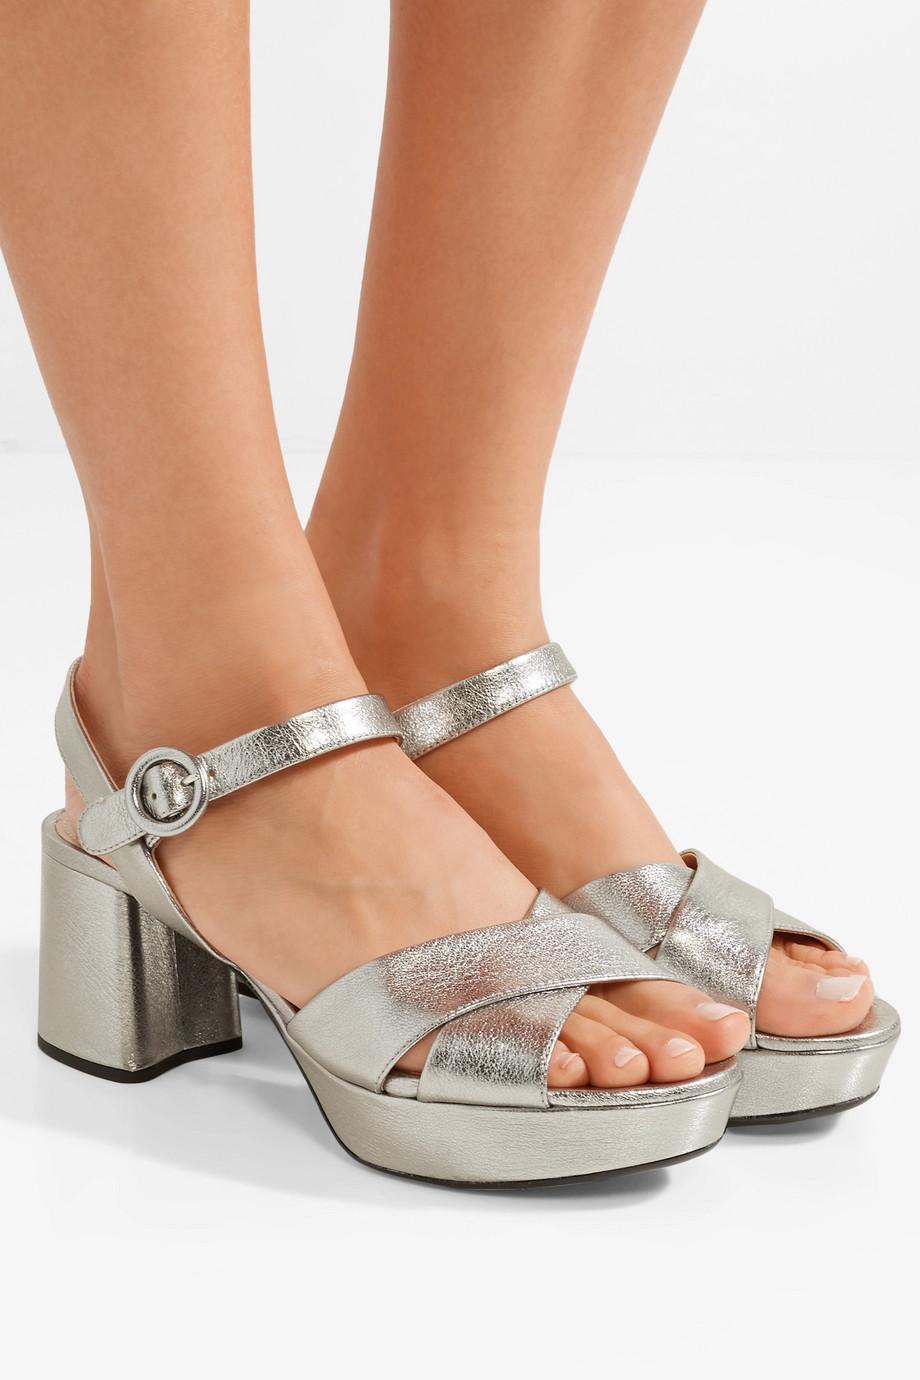 Prada 65 metallic textured-leather platform sandals